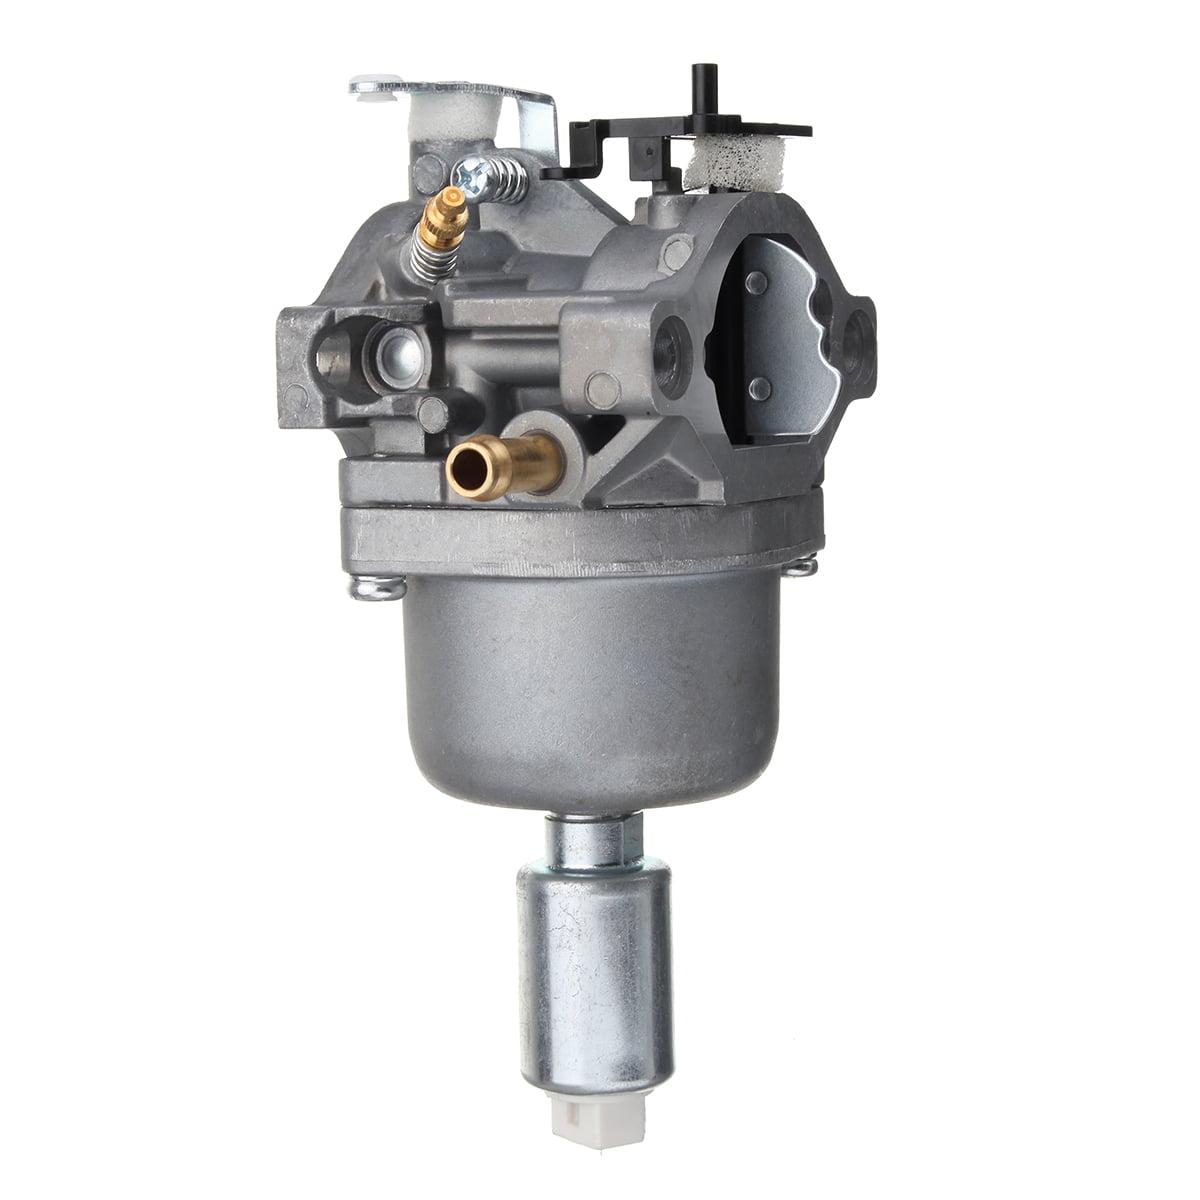 Carburetor CARB for Briggs /& Stratton 287707 287776 287777 310707 310777 Motors